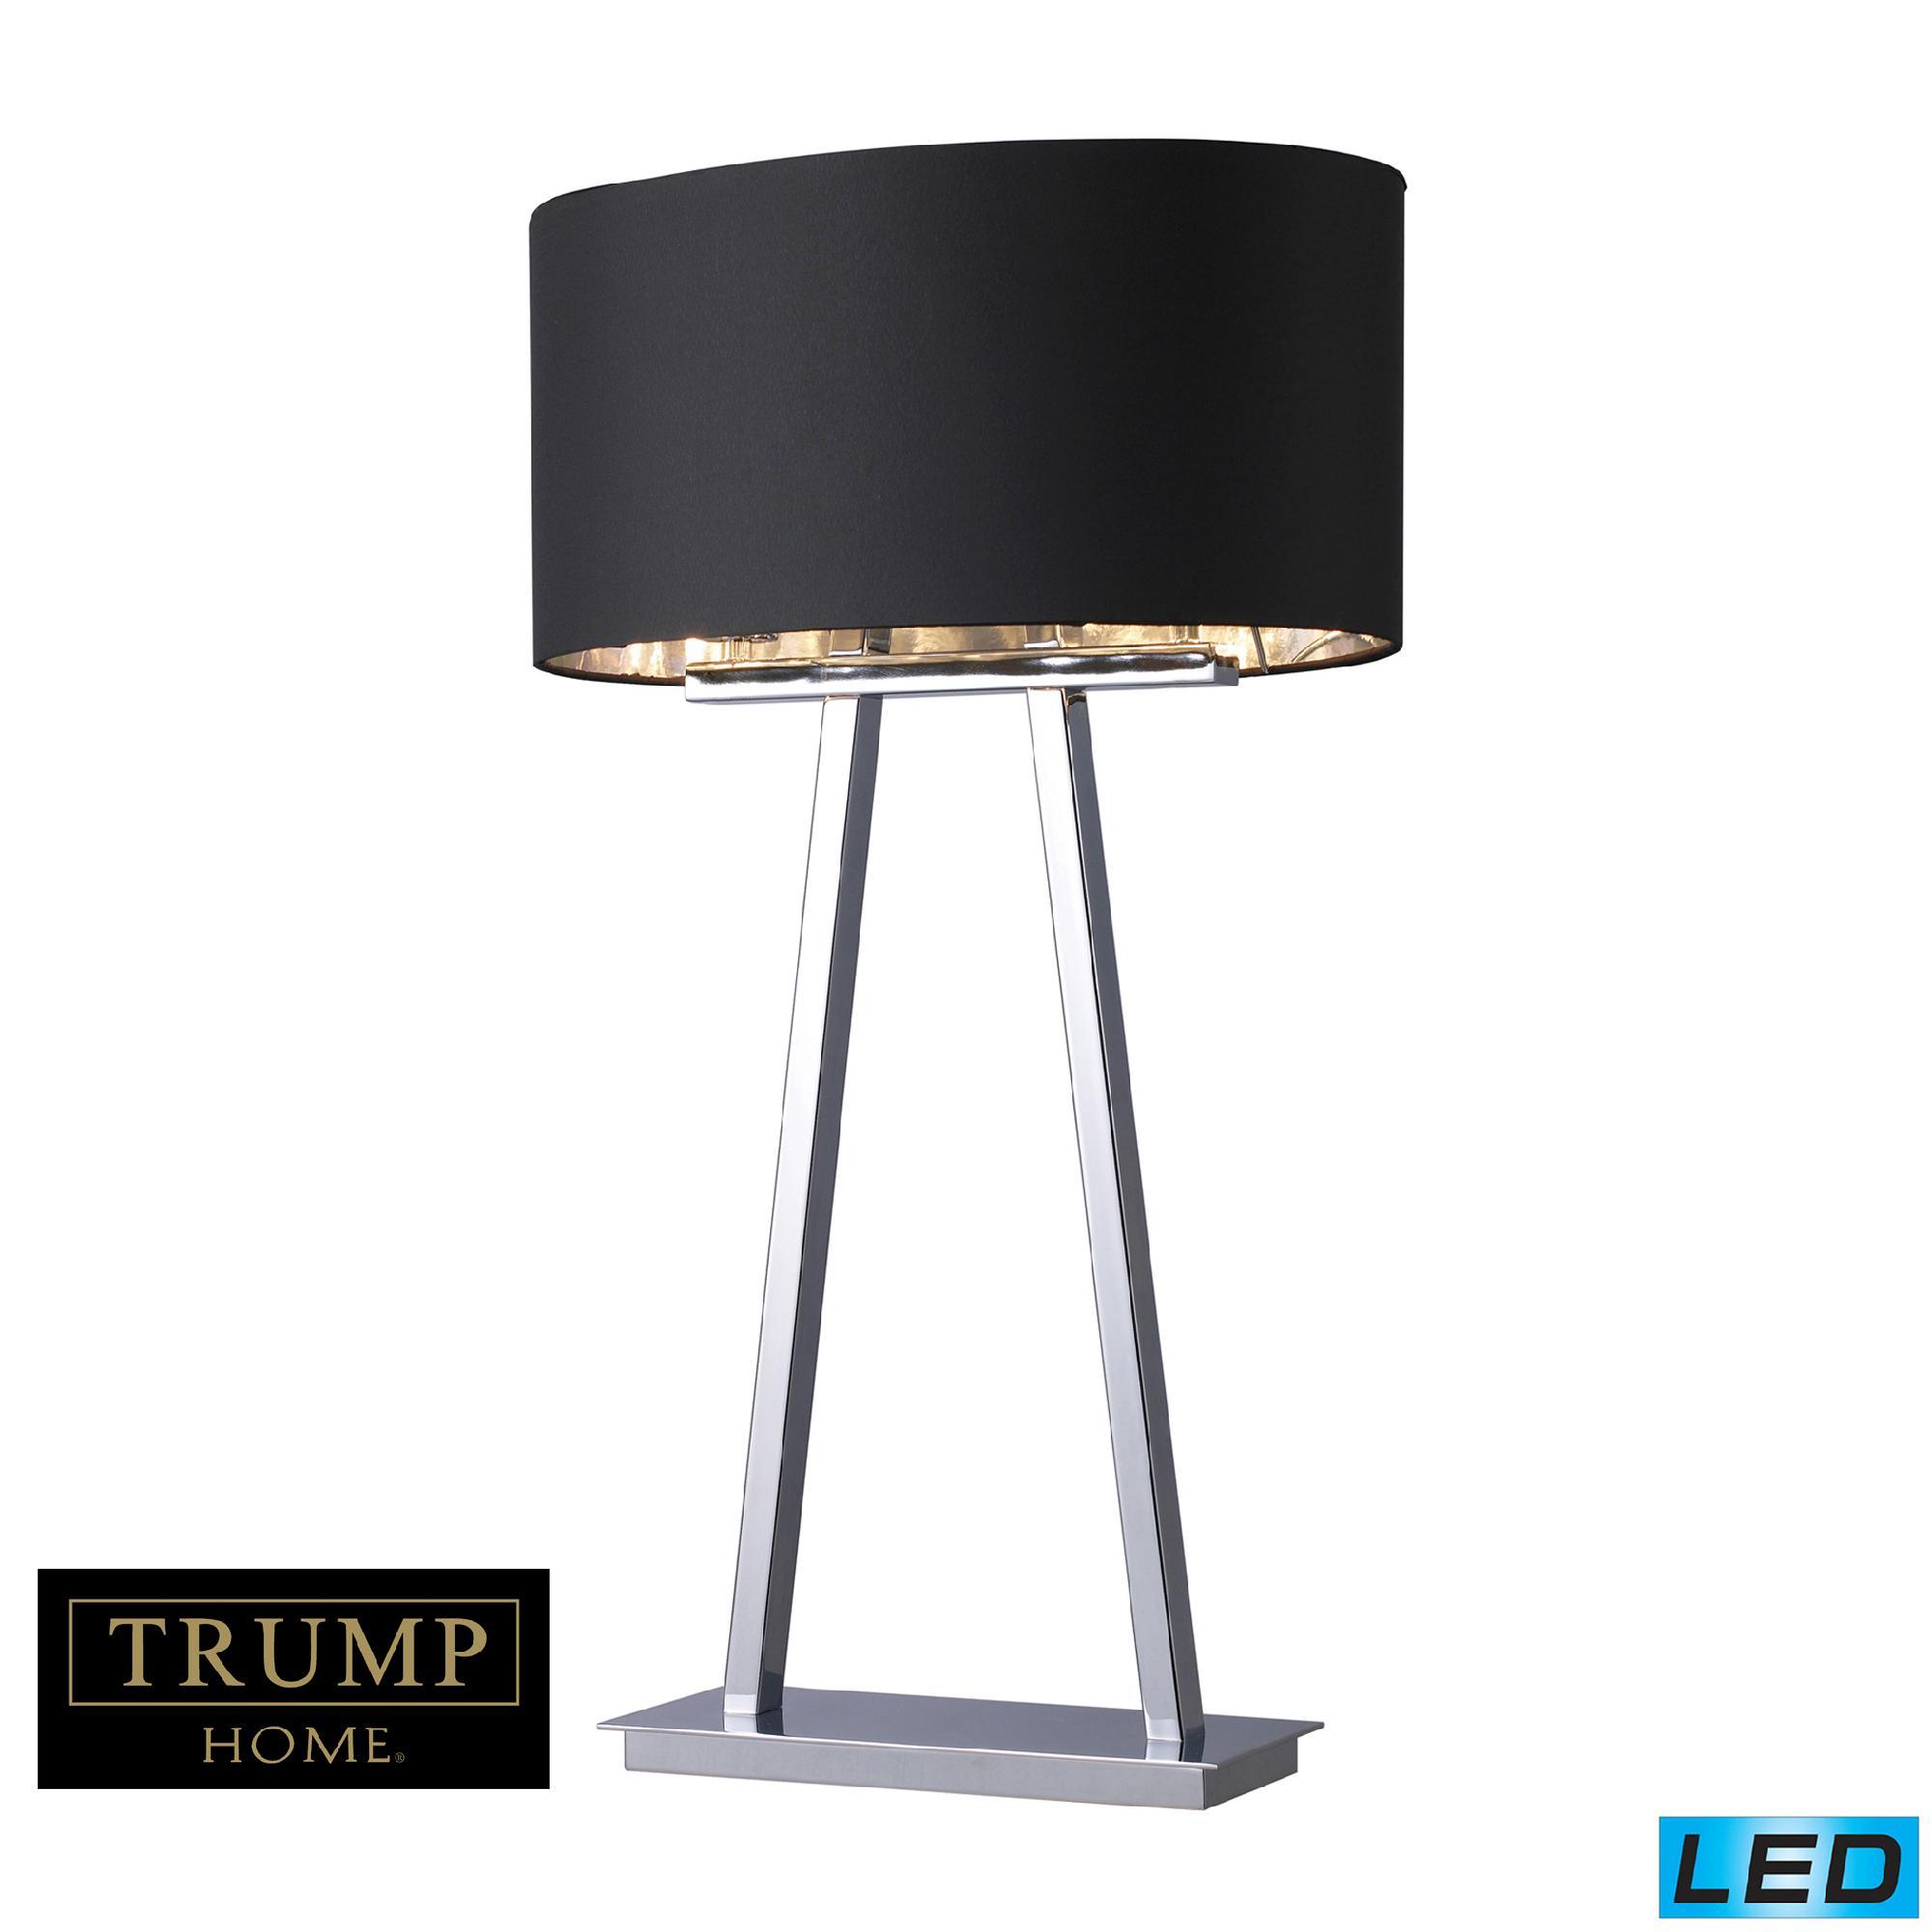 Dimond Trump Home Empire 2 Light Table Lamp- LED